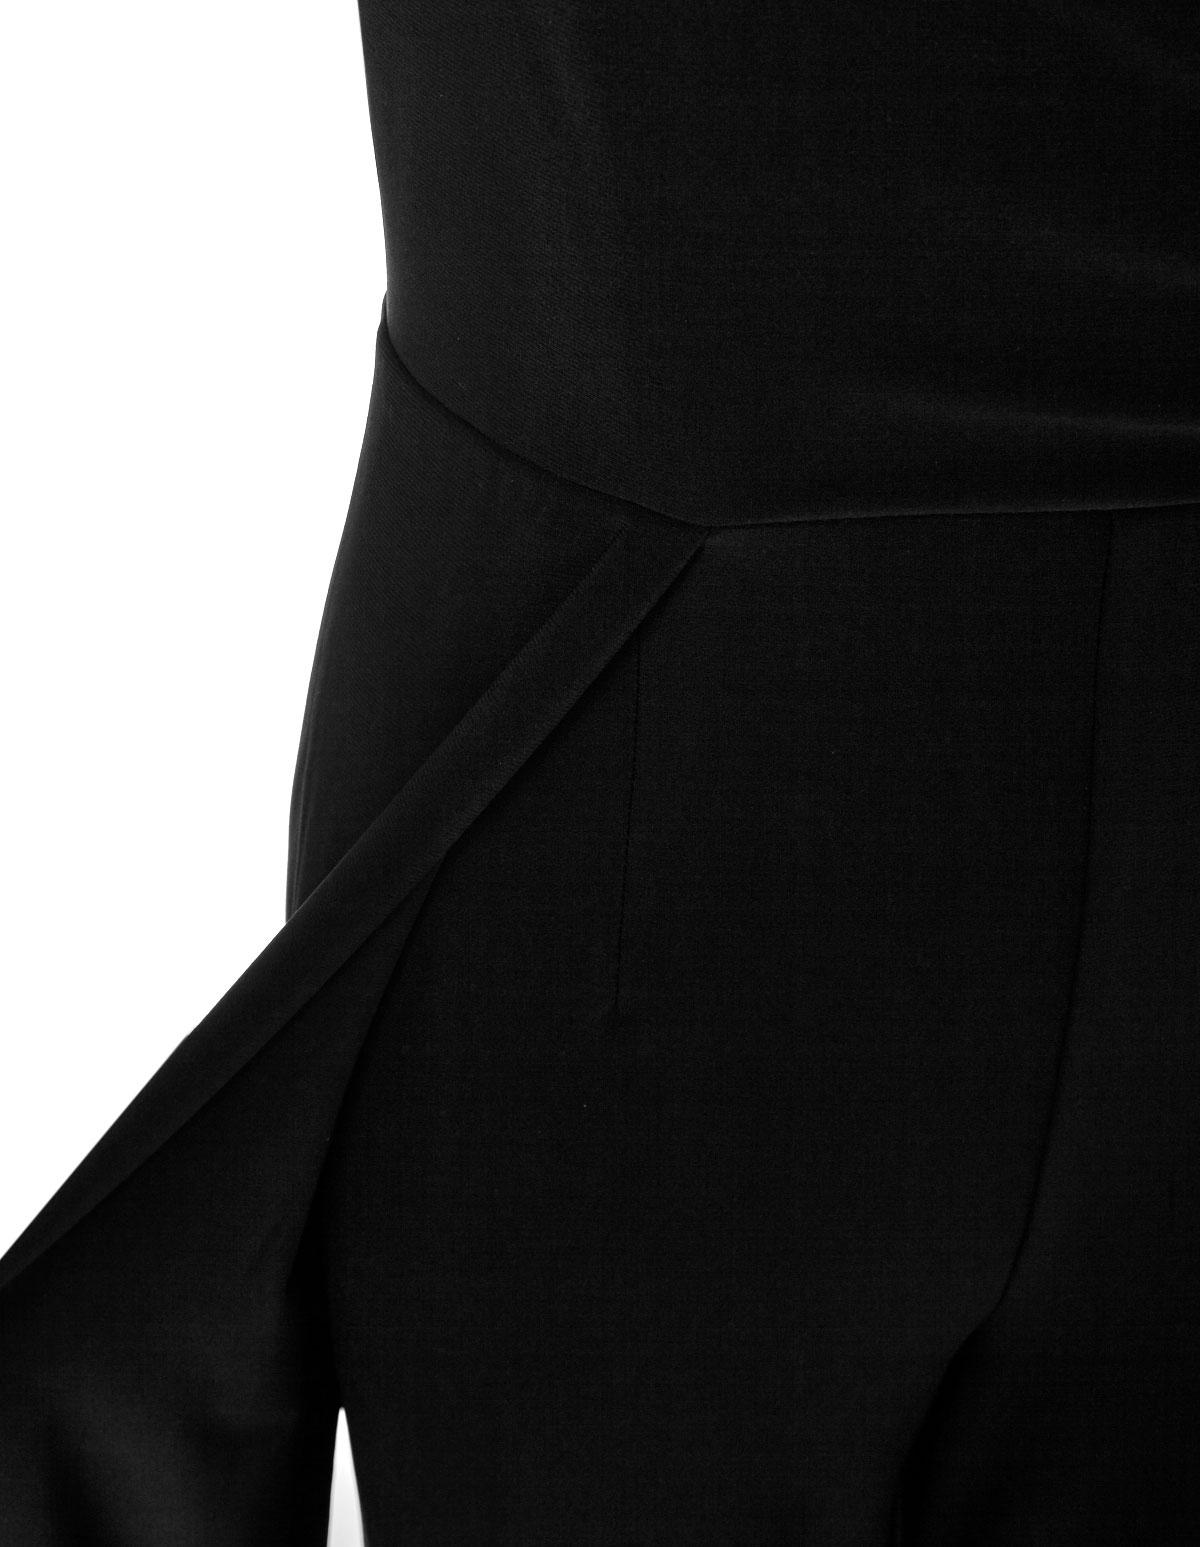 ad570f419f9 ... Black Jumpsuit